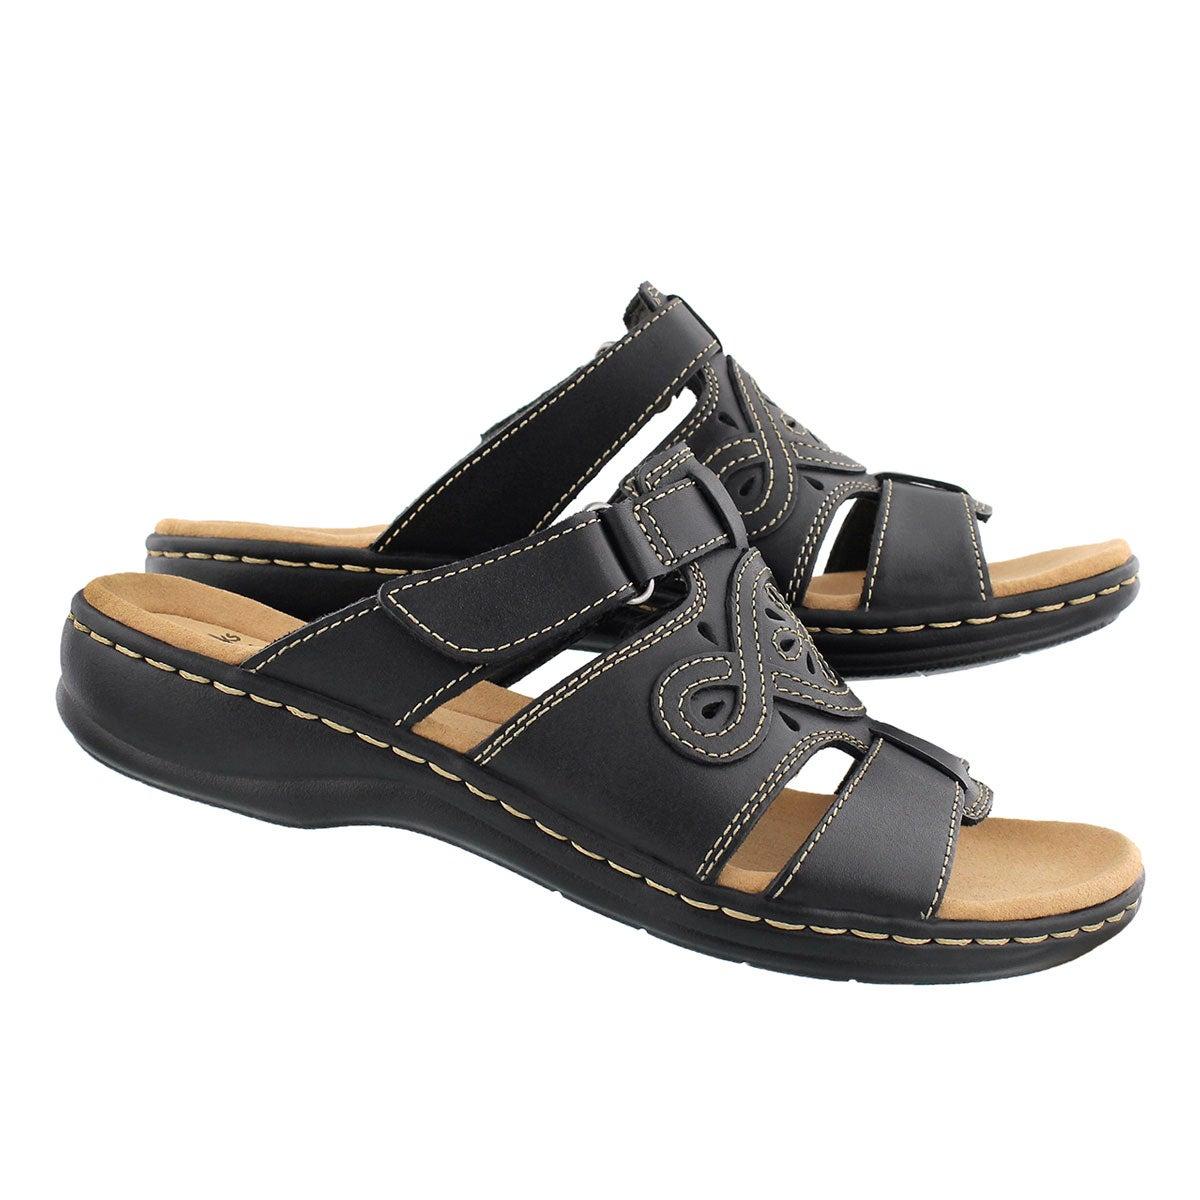 Lds Leisa Higley black casual slide sndl